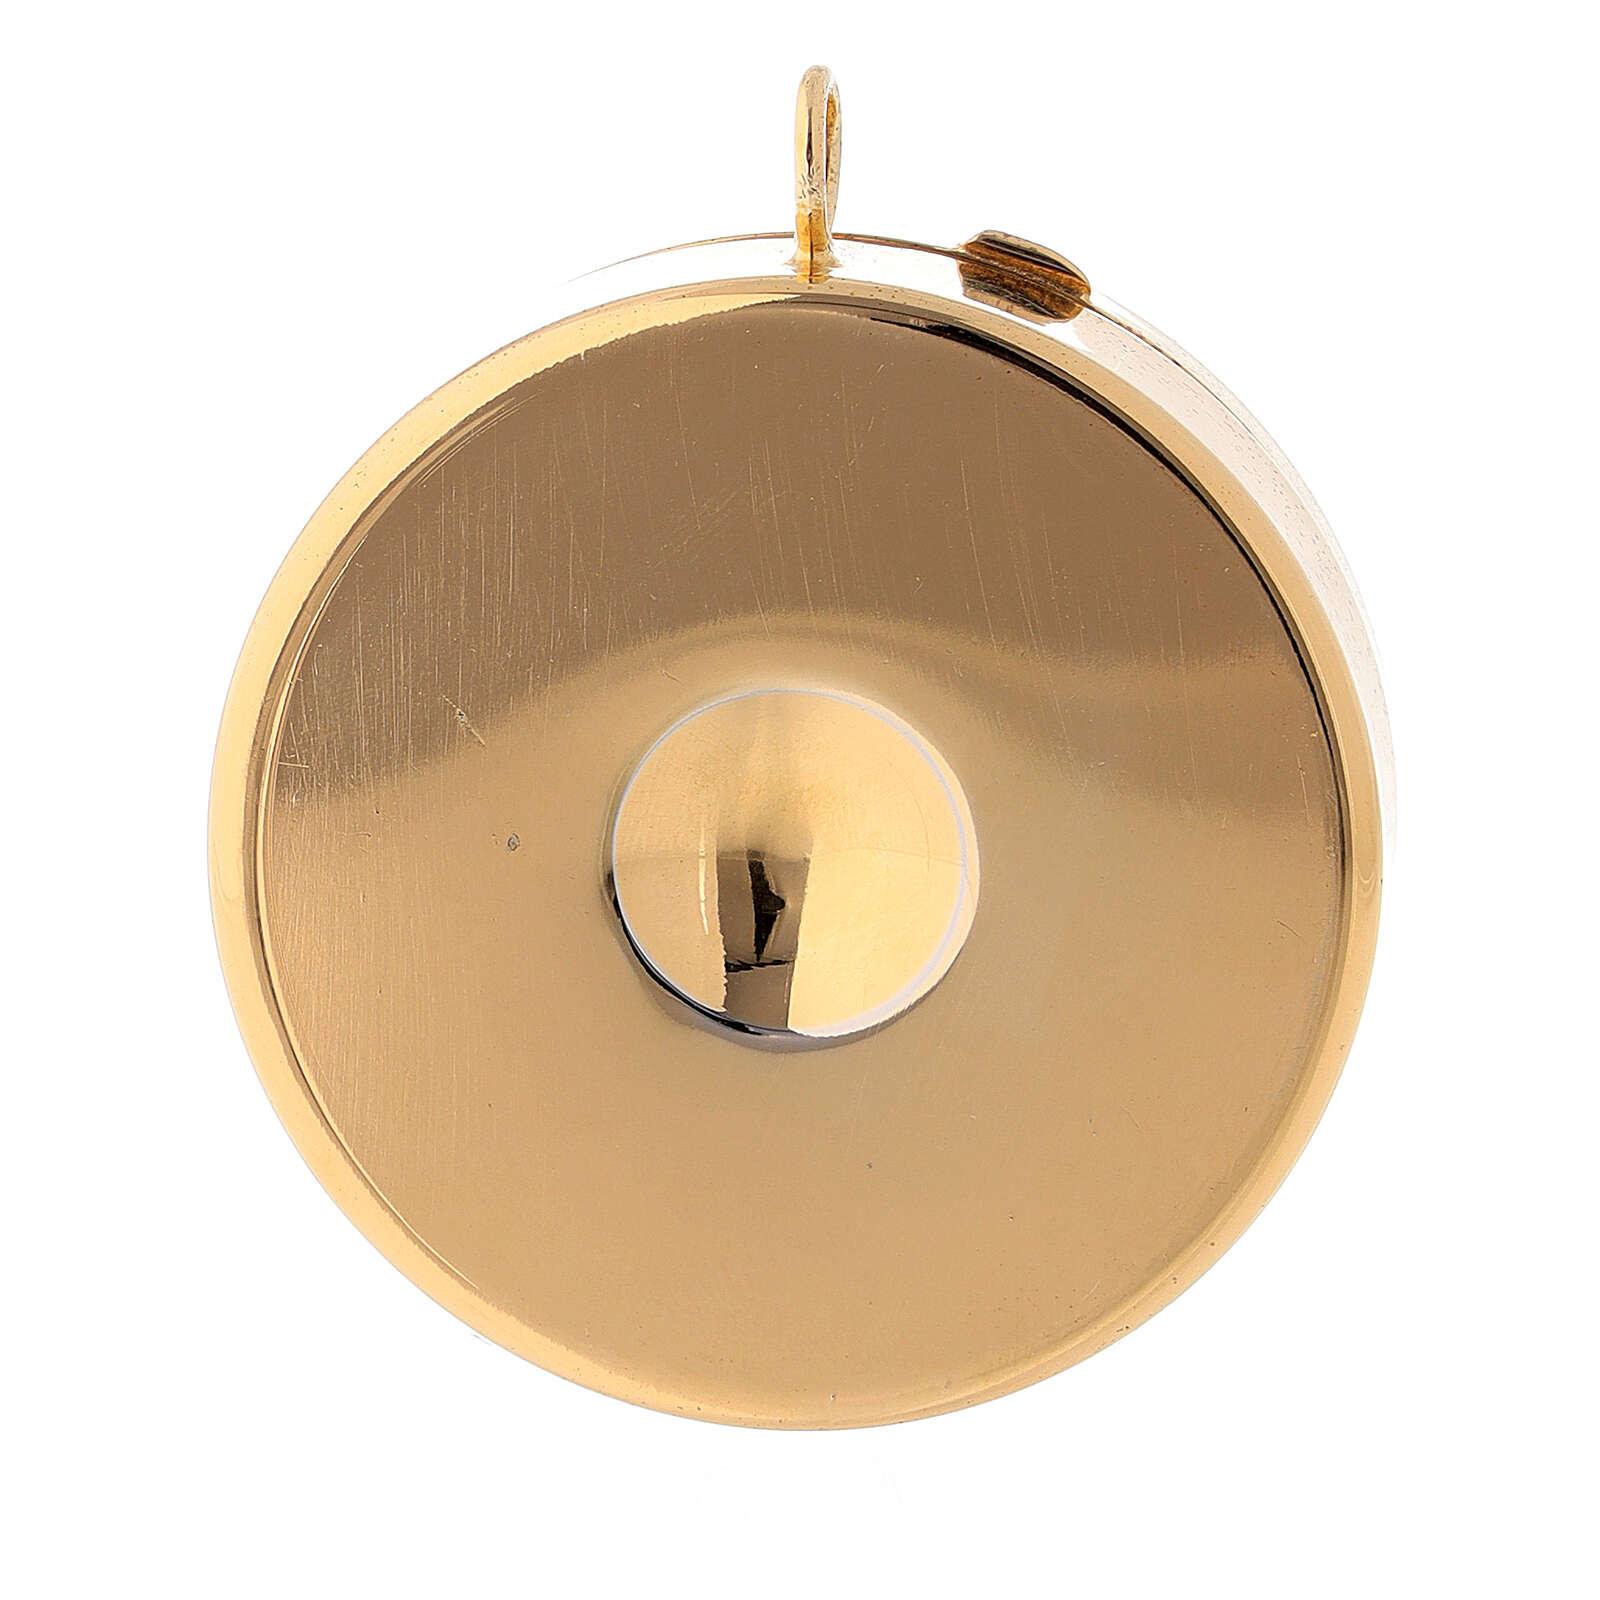 Teca portaostie IHS smaltato argento 800 dorato 3